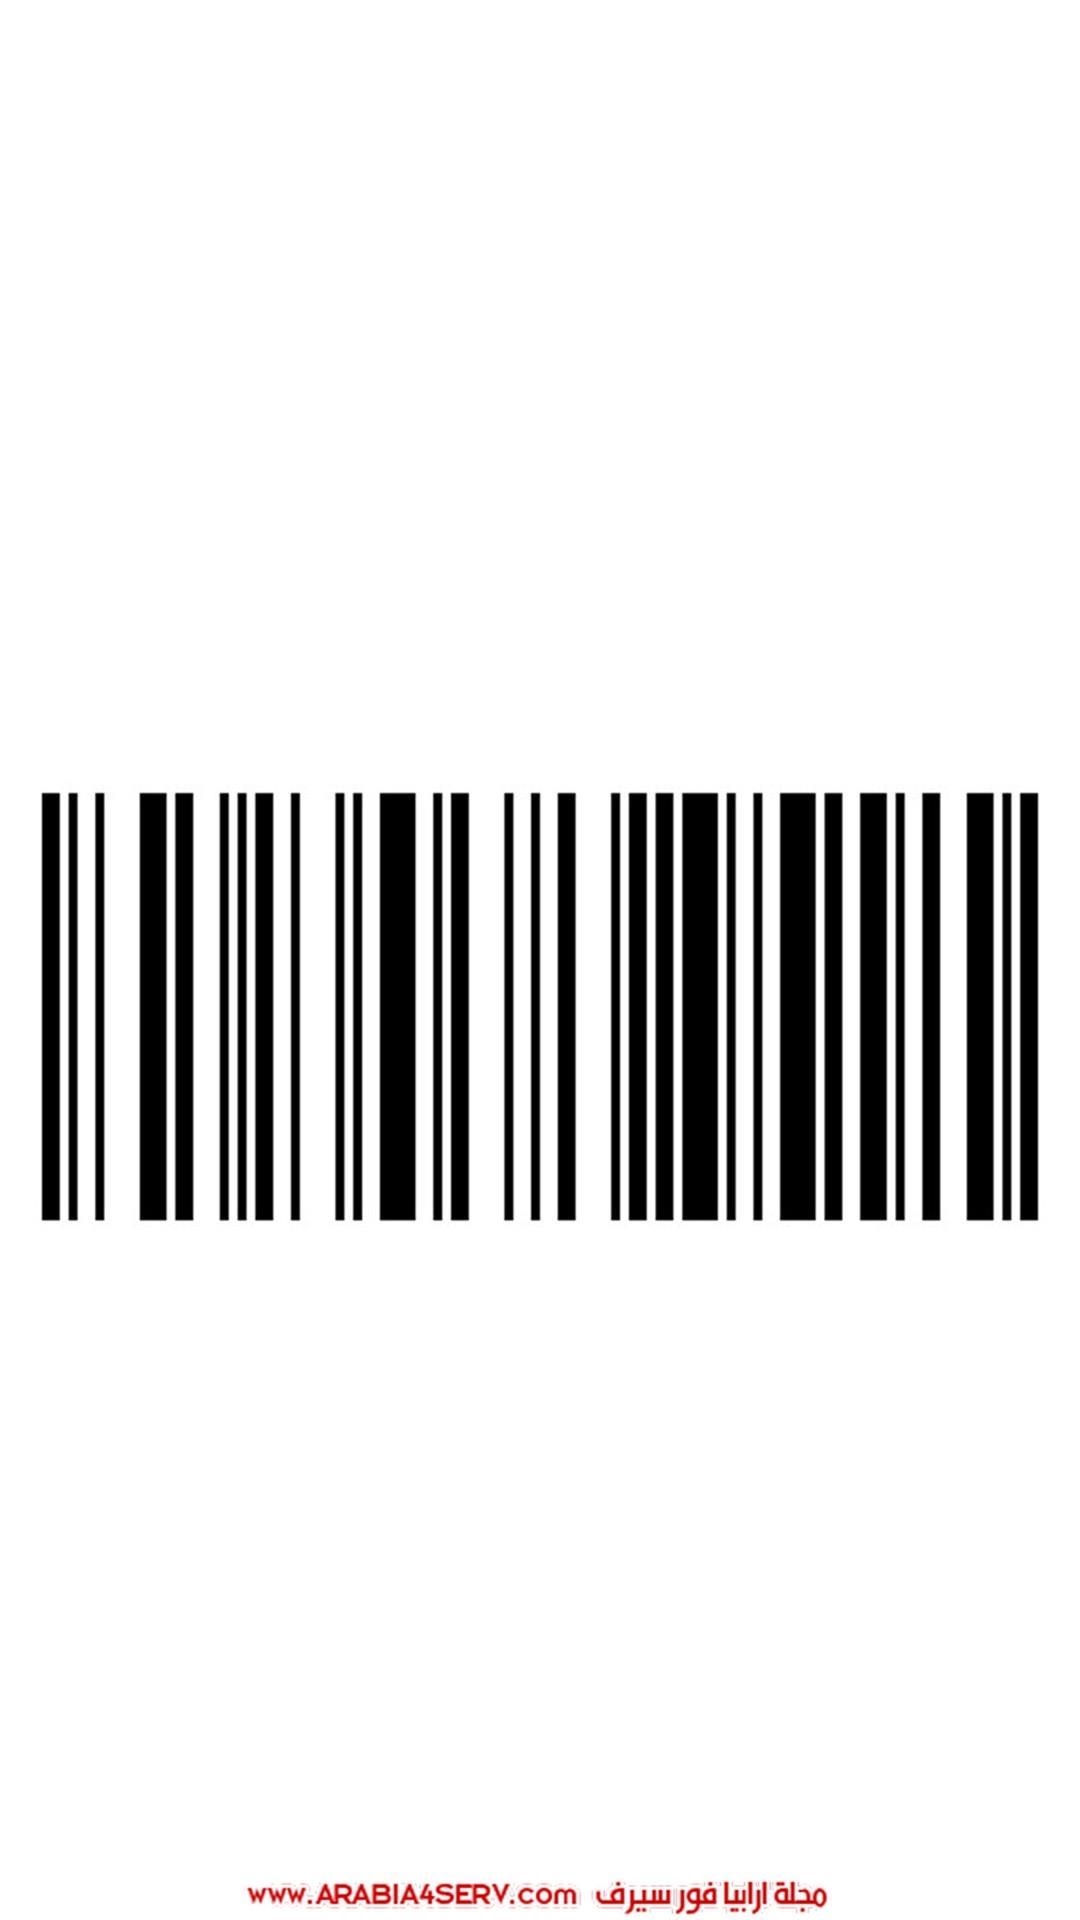 خلفيات-موبايل-جوال-لينوفو-فايب-اكس-Lenovo-Vibe-X-S960-1